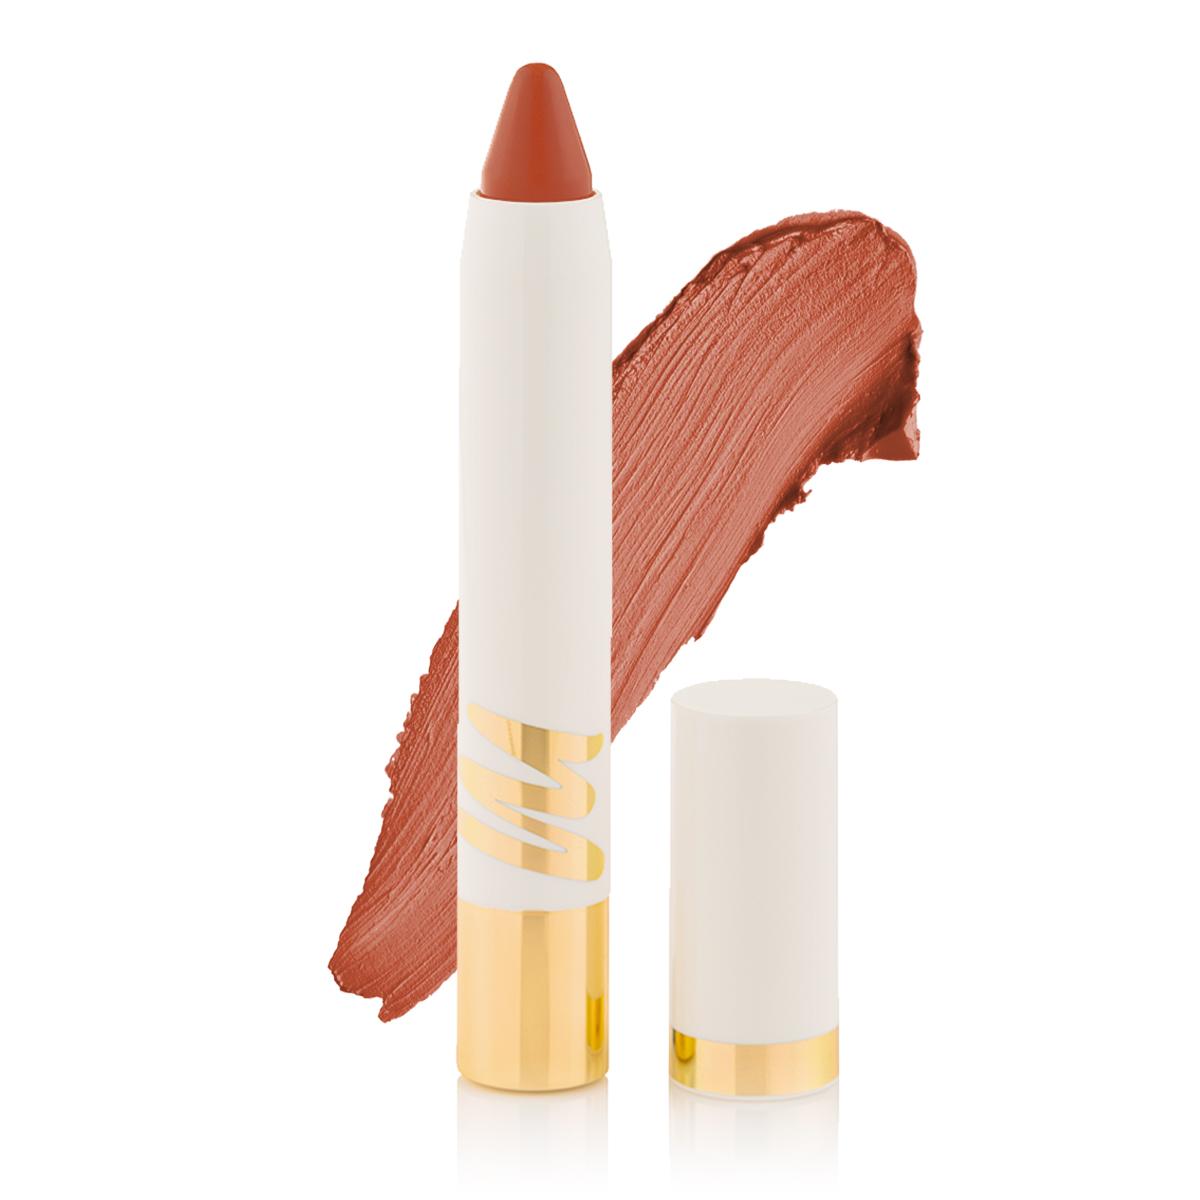 2 in 1 Matte Lipstick + Lip Liner - Biscotti